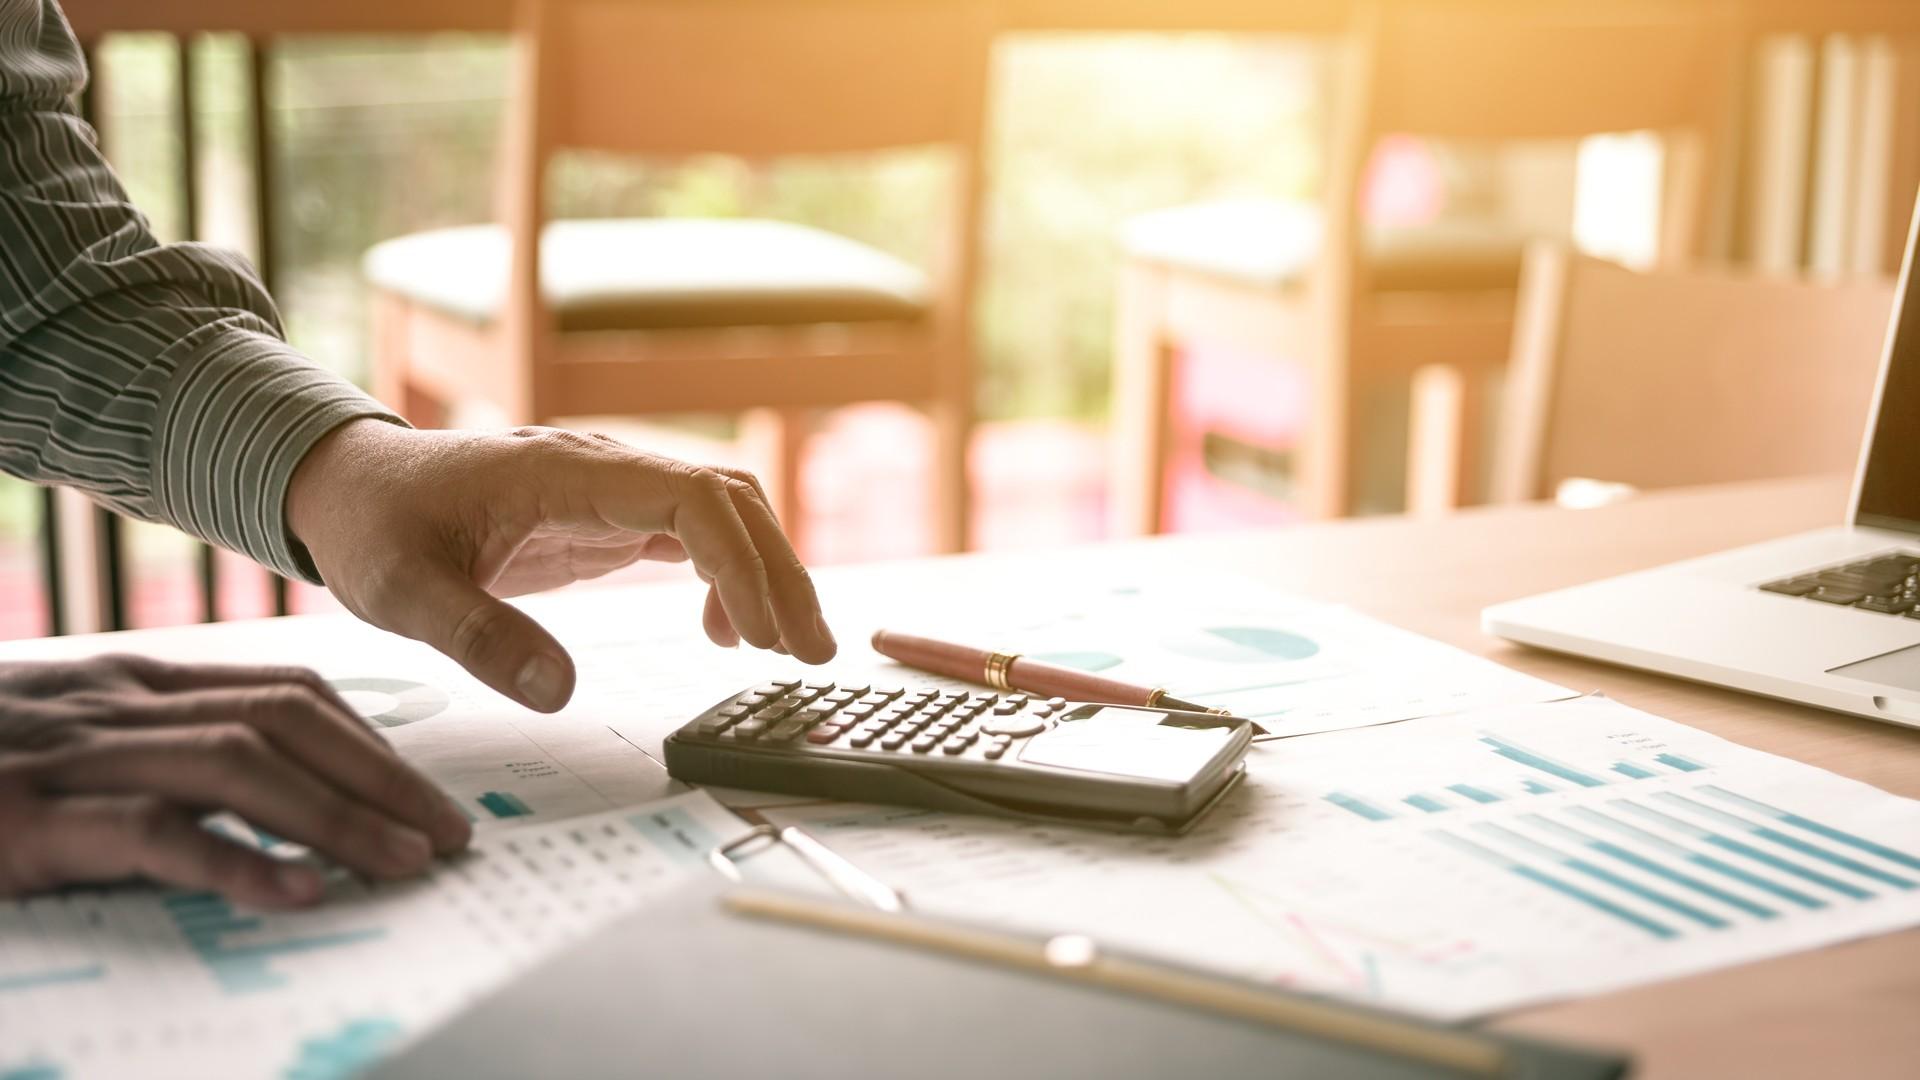 000 gestoria asesoria inmobiliaria contable economia calculadora